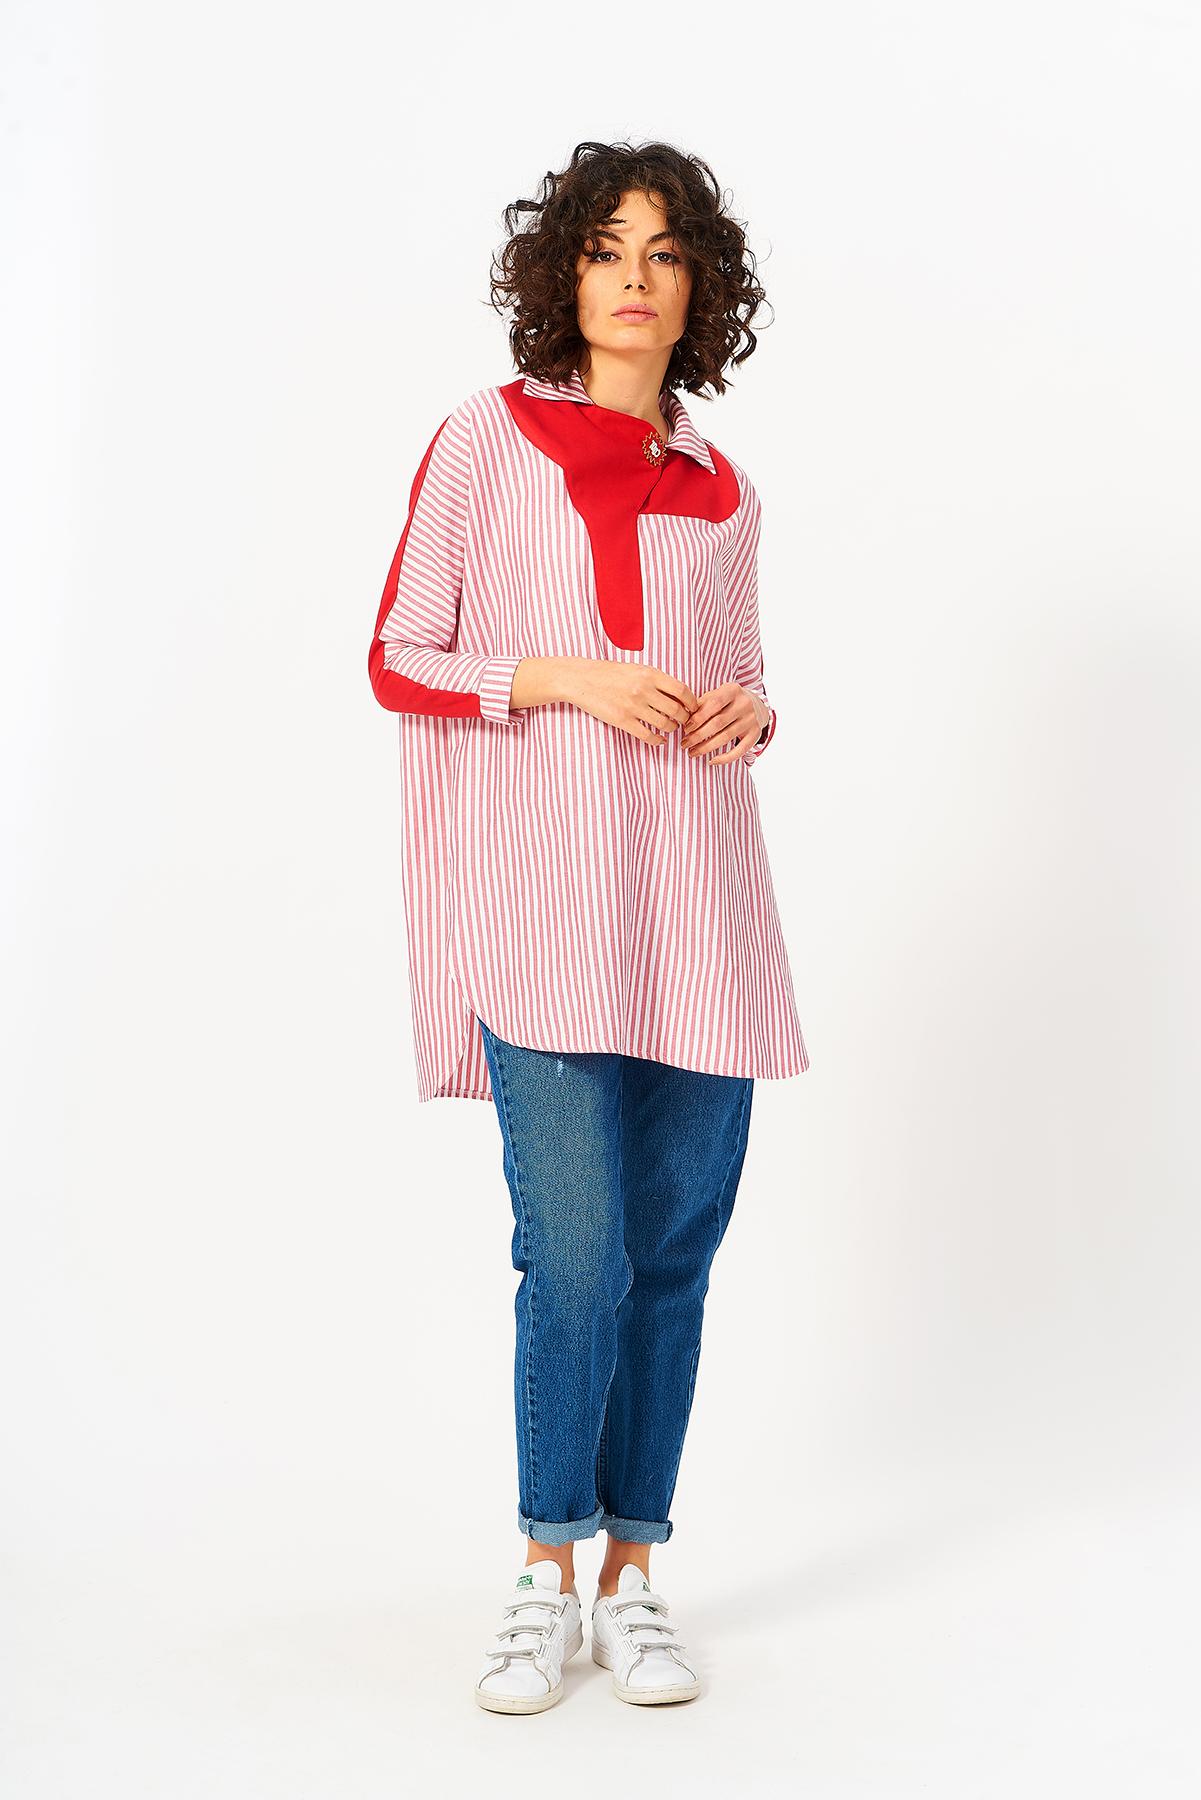 Mevra - Cool Tunik Kırmızı